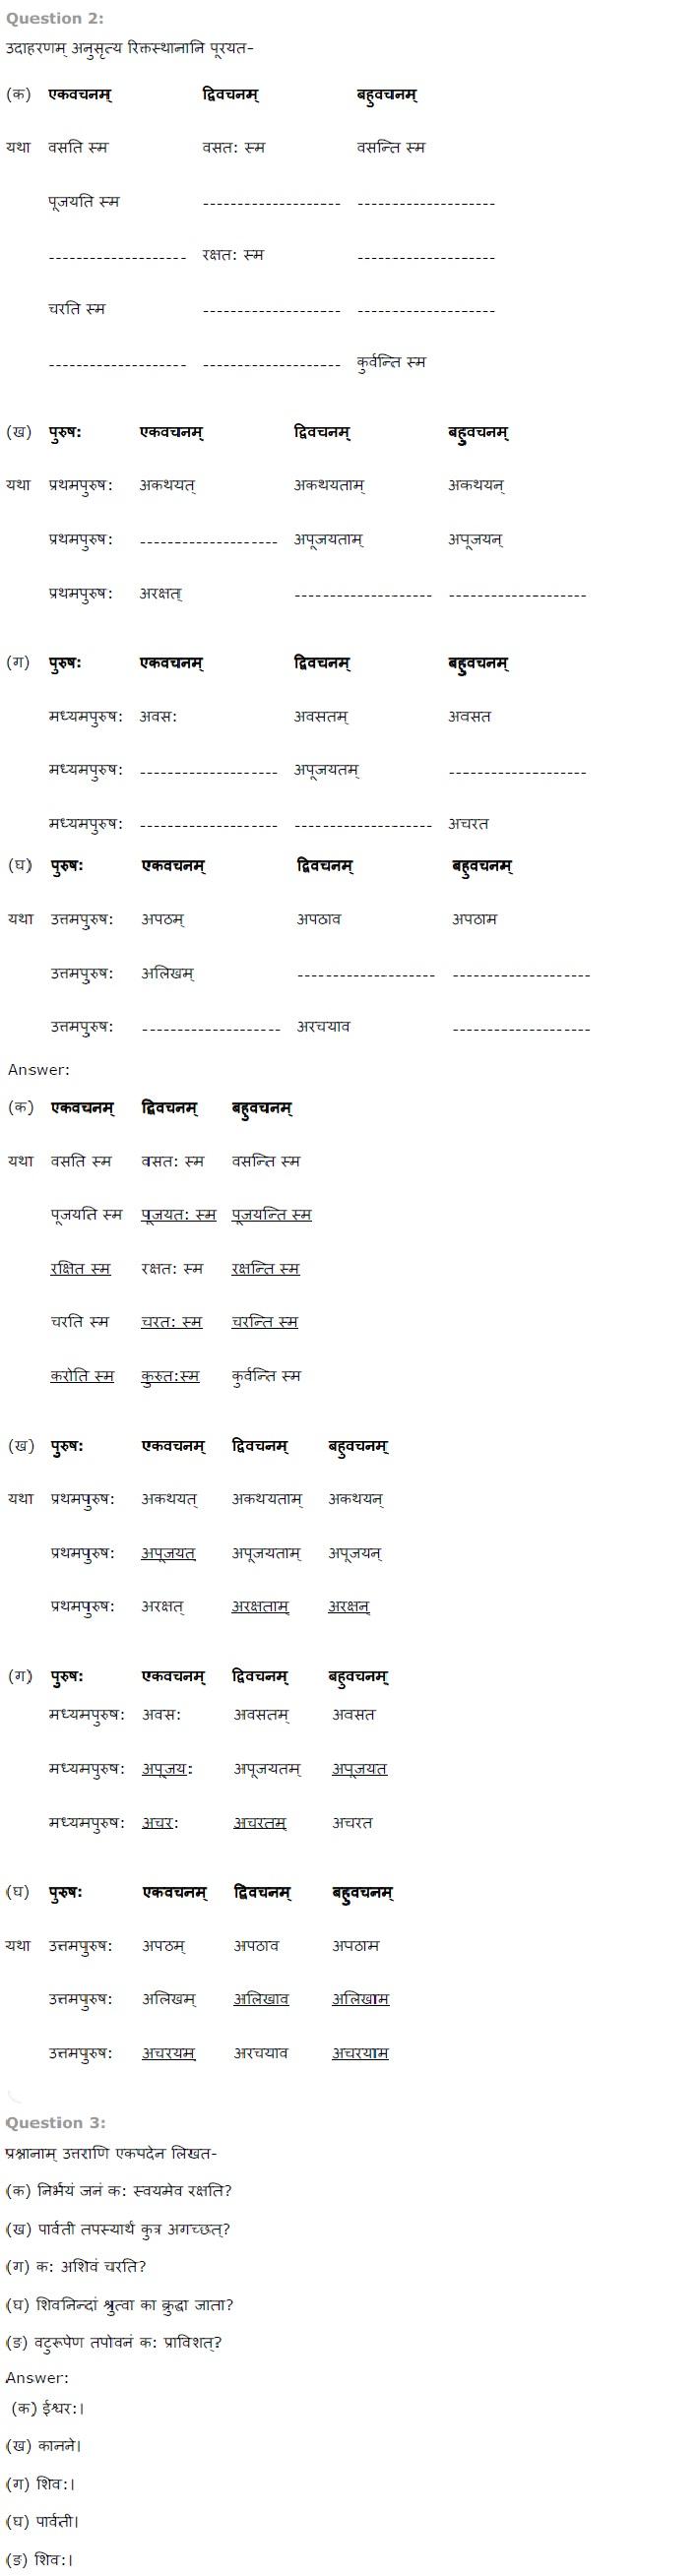 NCERT Solutions for Class 7th Sanskrit Chapter 7 - संकल्प सिद्धिदायक (धातुप्रयोग )